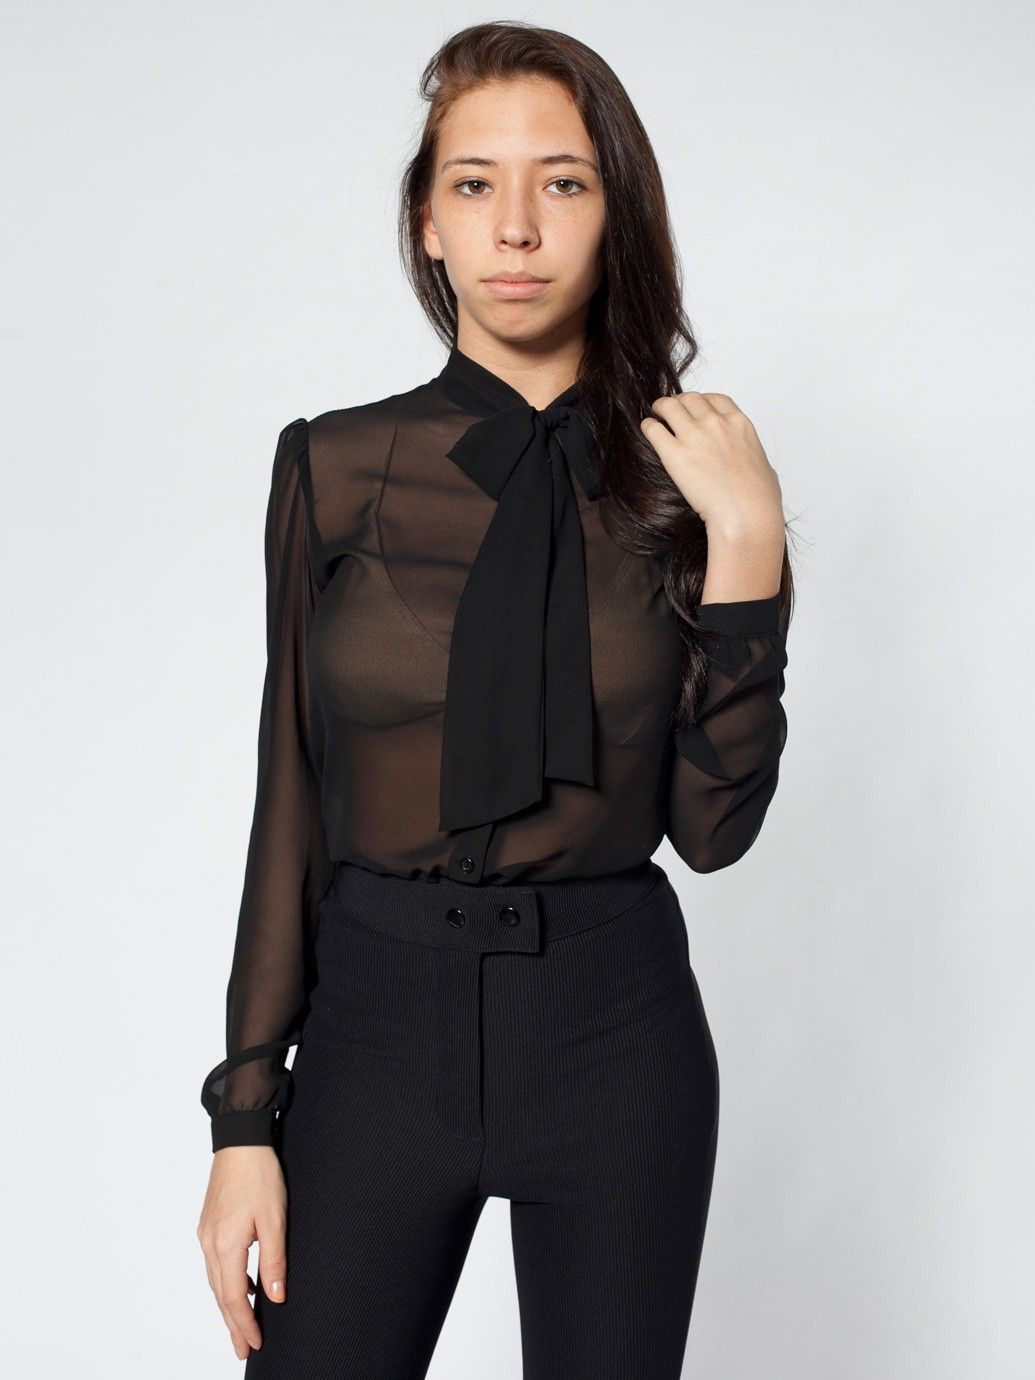 557fb492c Chiffon Secretary Blouse | Blouses & Shirts | Women's Tops | American  Apparel